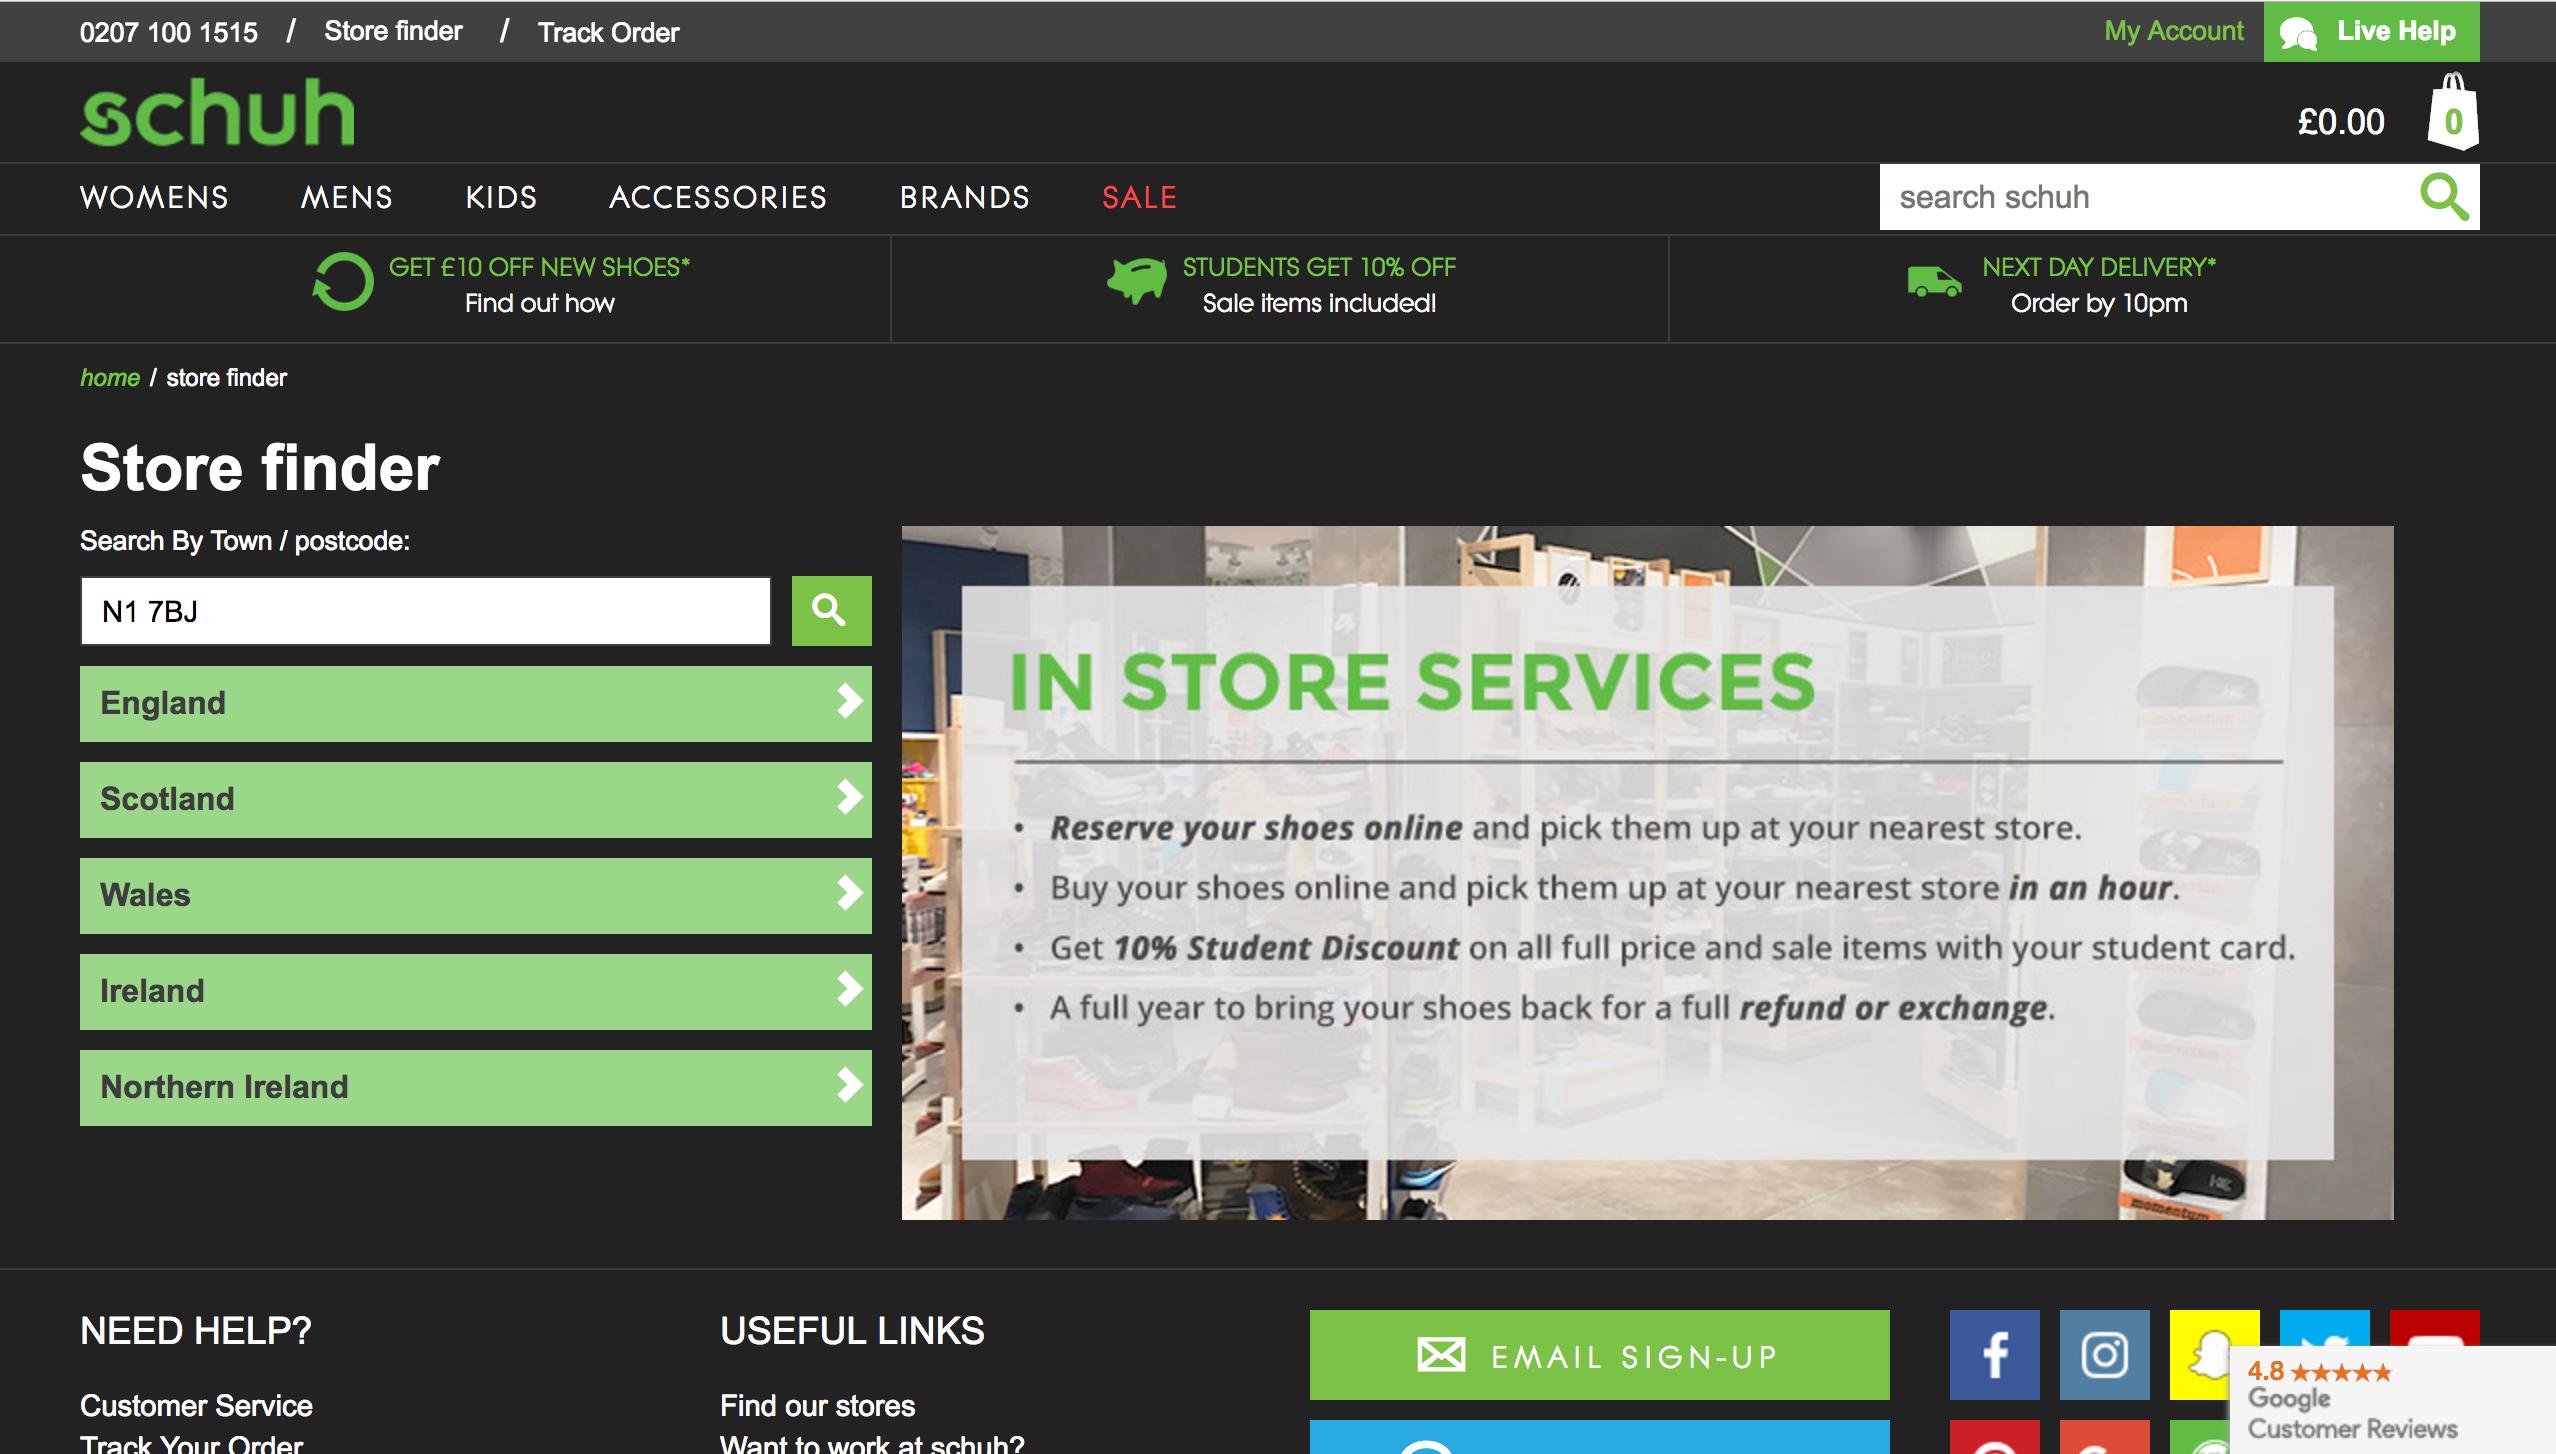 schuh-store-finder-uk-desktop